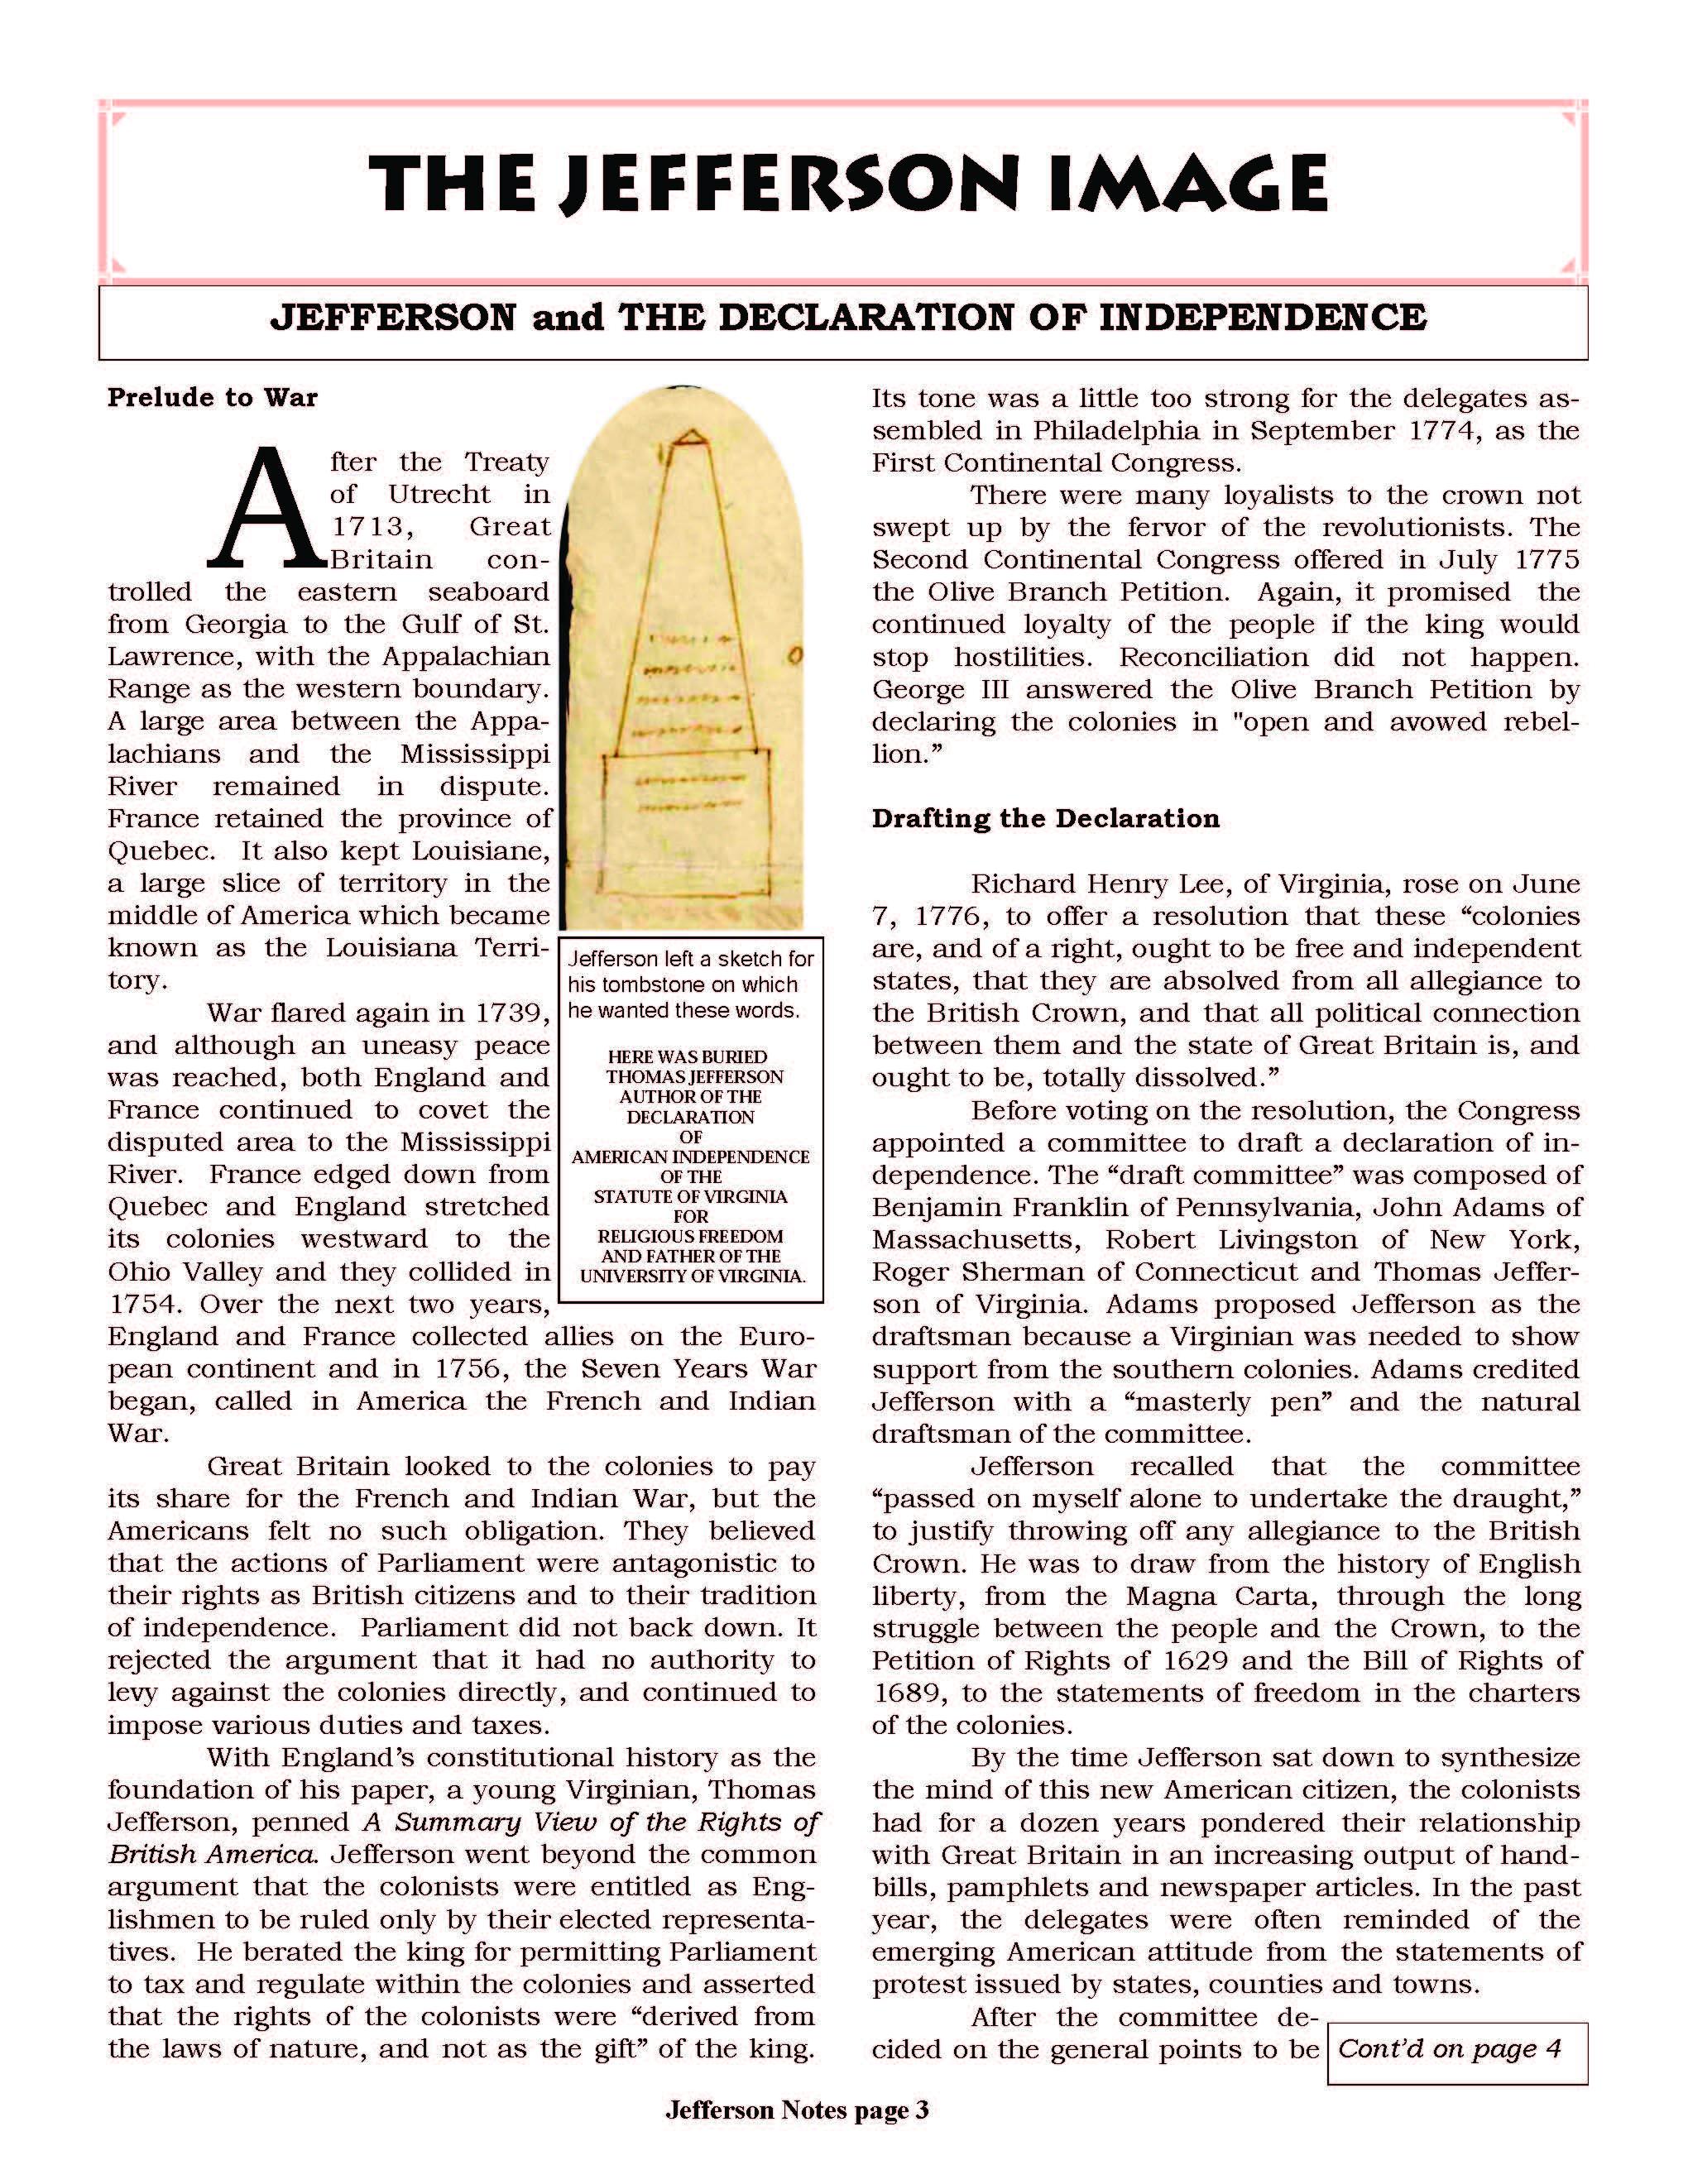 jeffersonimagespring2010-declaration-independence_Page_1.jpg